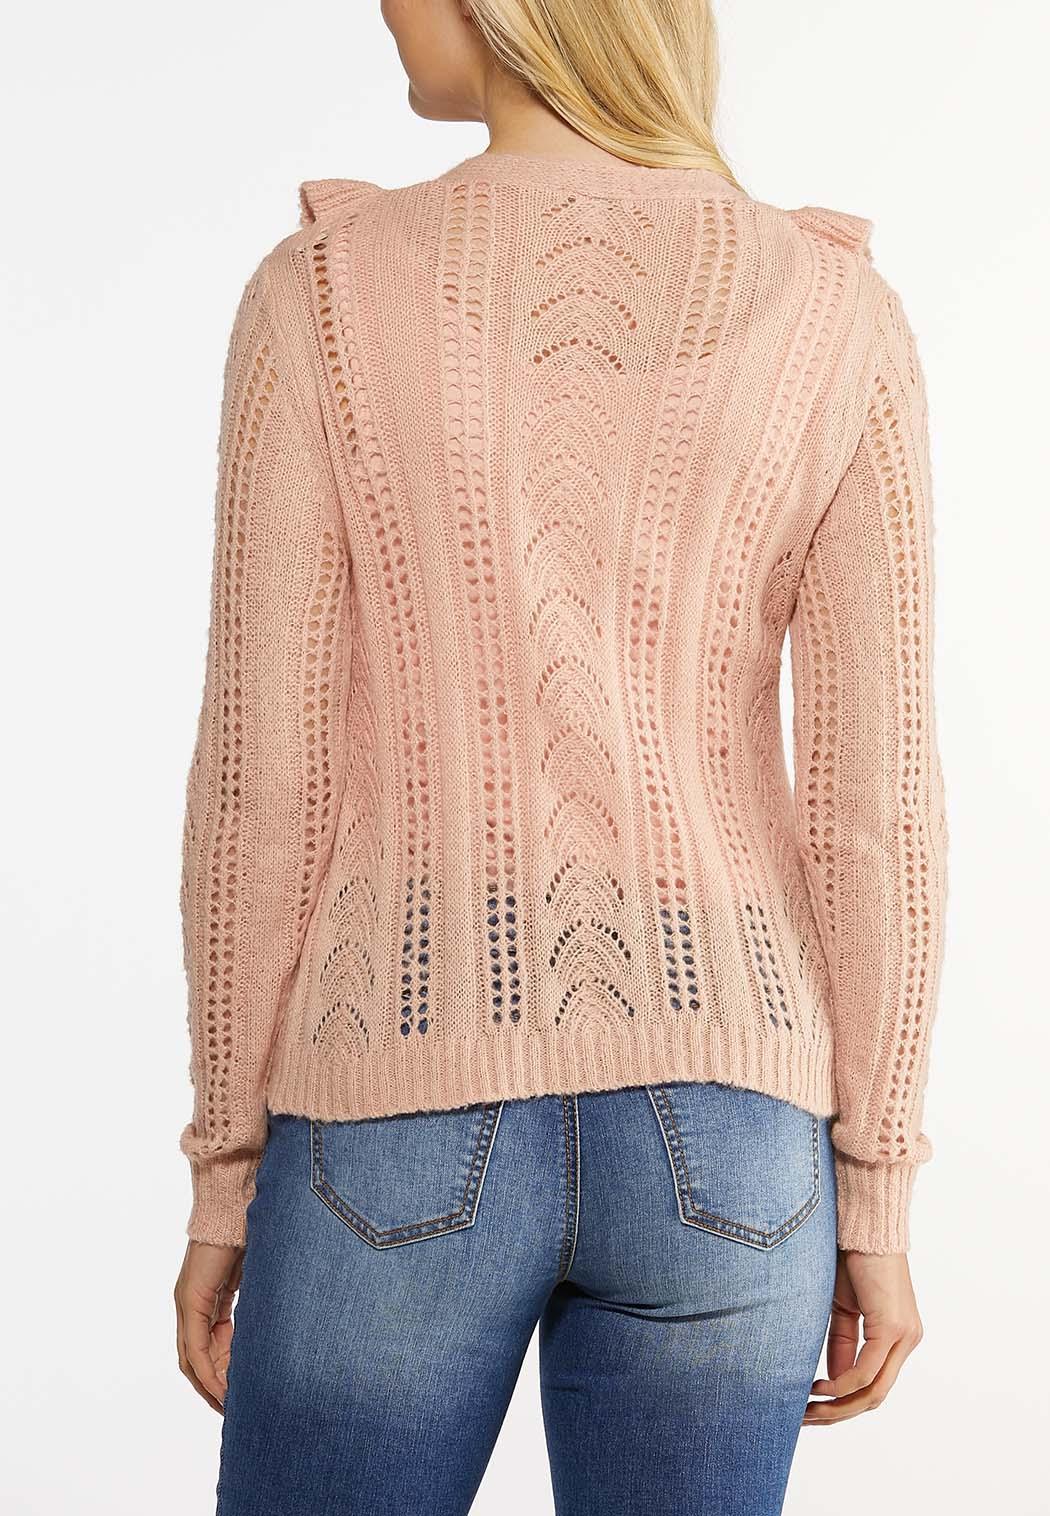 Ruffled Stitch Cardigan Sweater (Item #44475689)